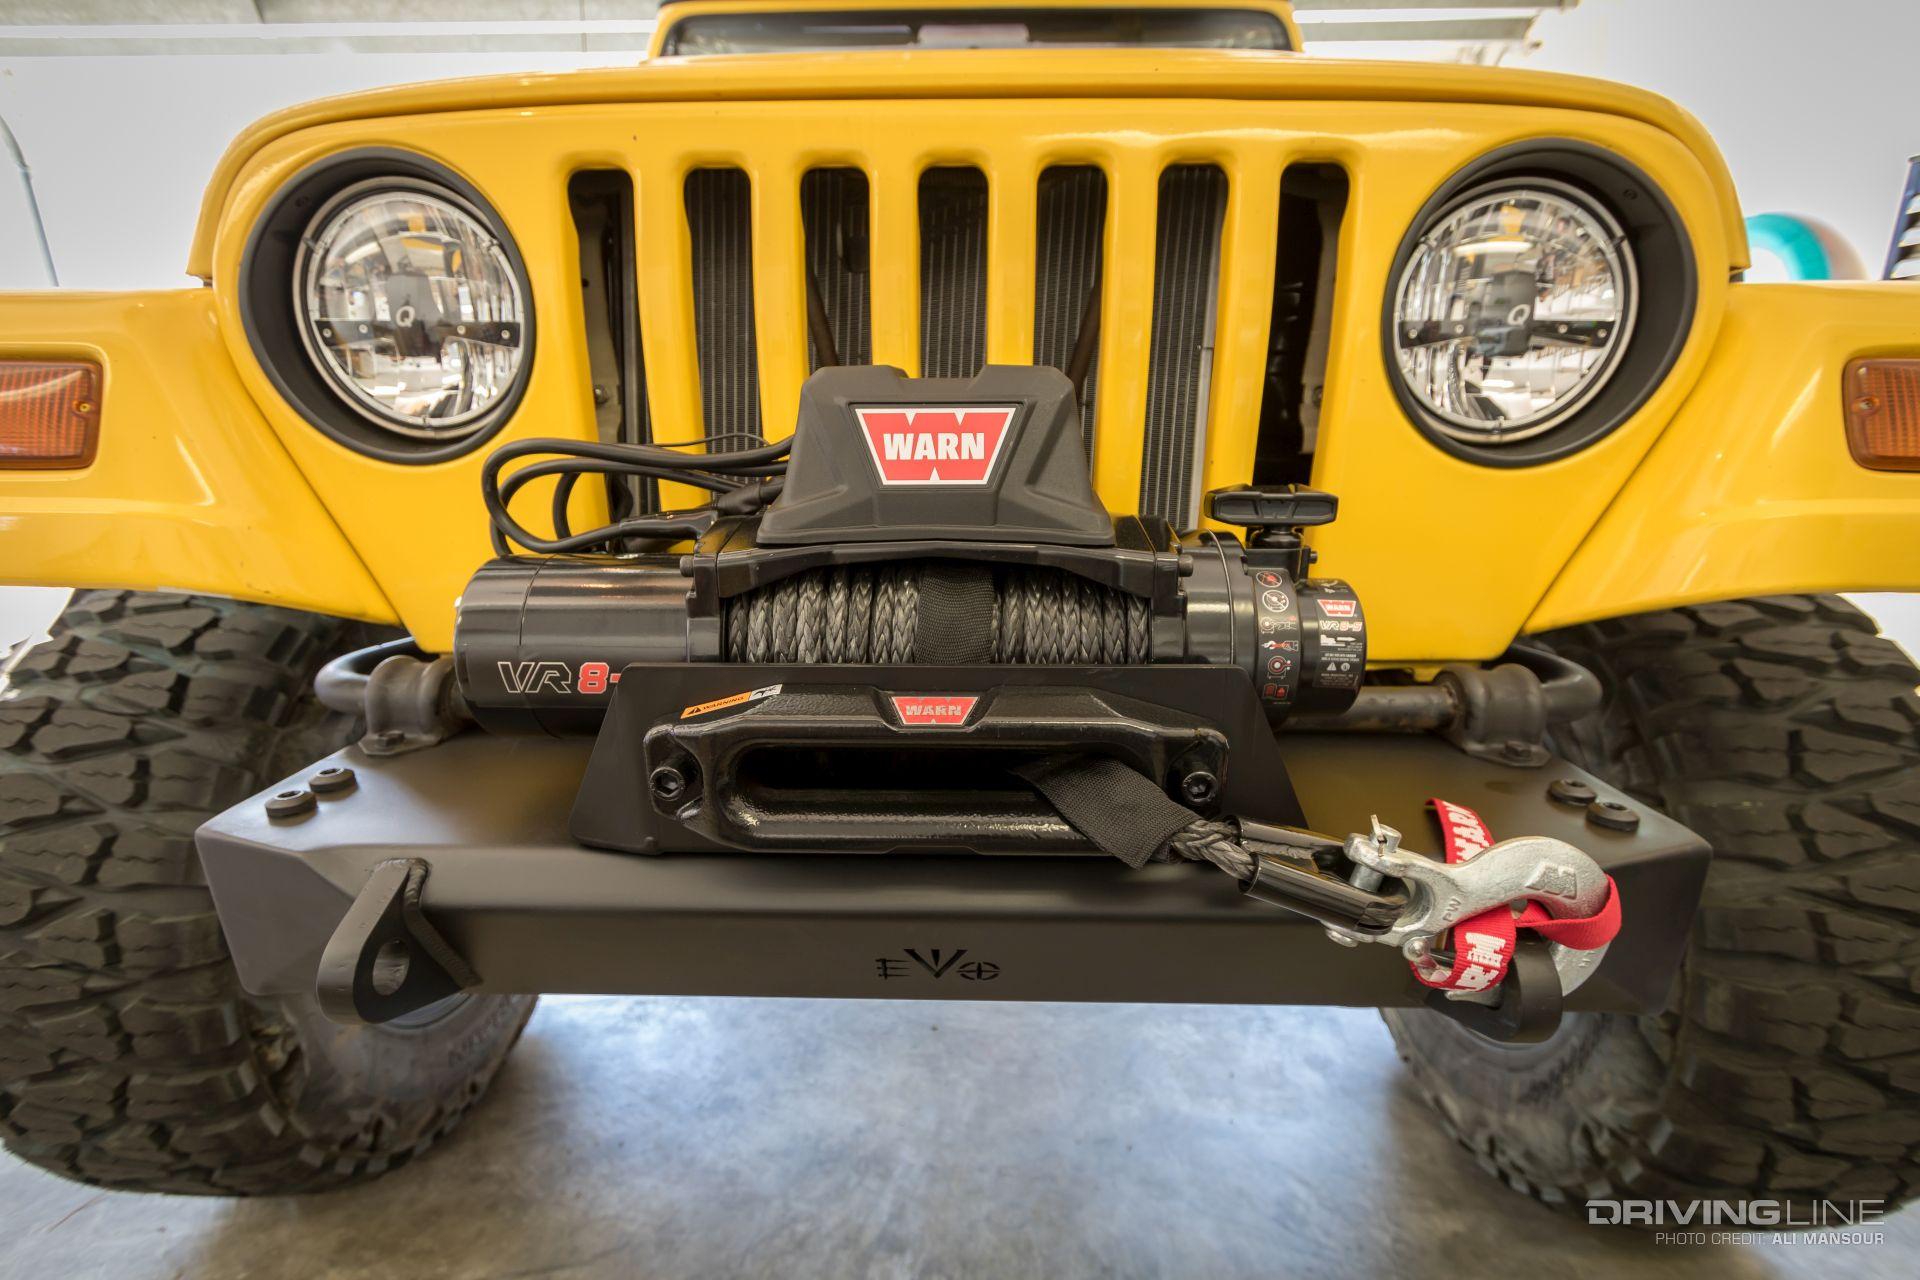 Evo Mfg Jeep Wrangler Tj Bumper Review Drivingline